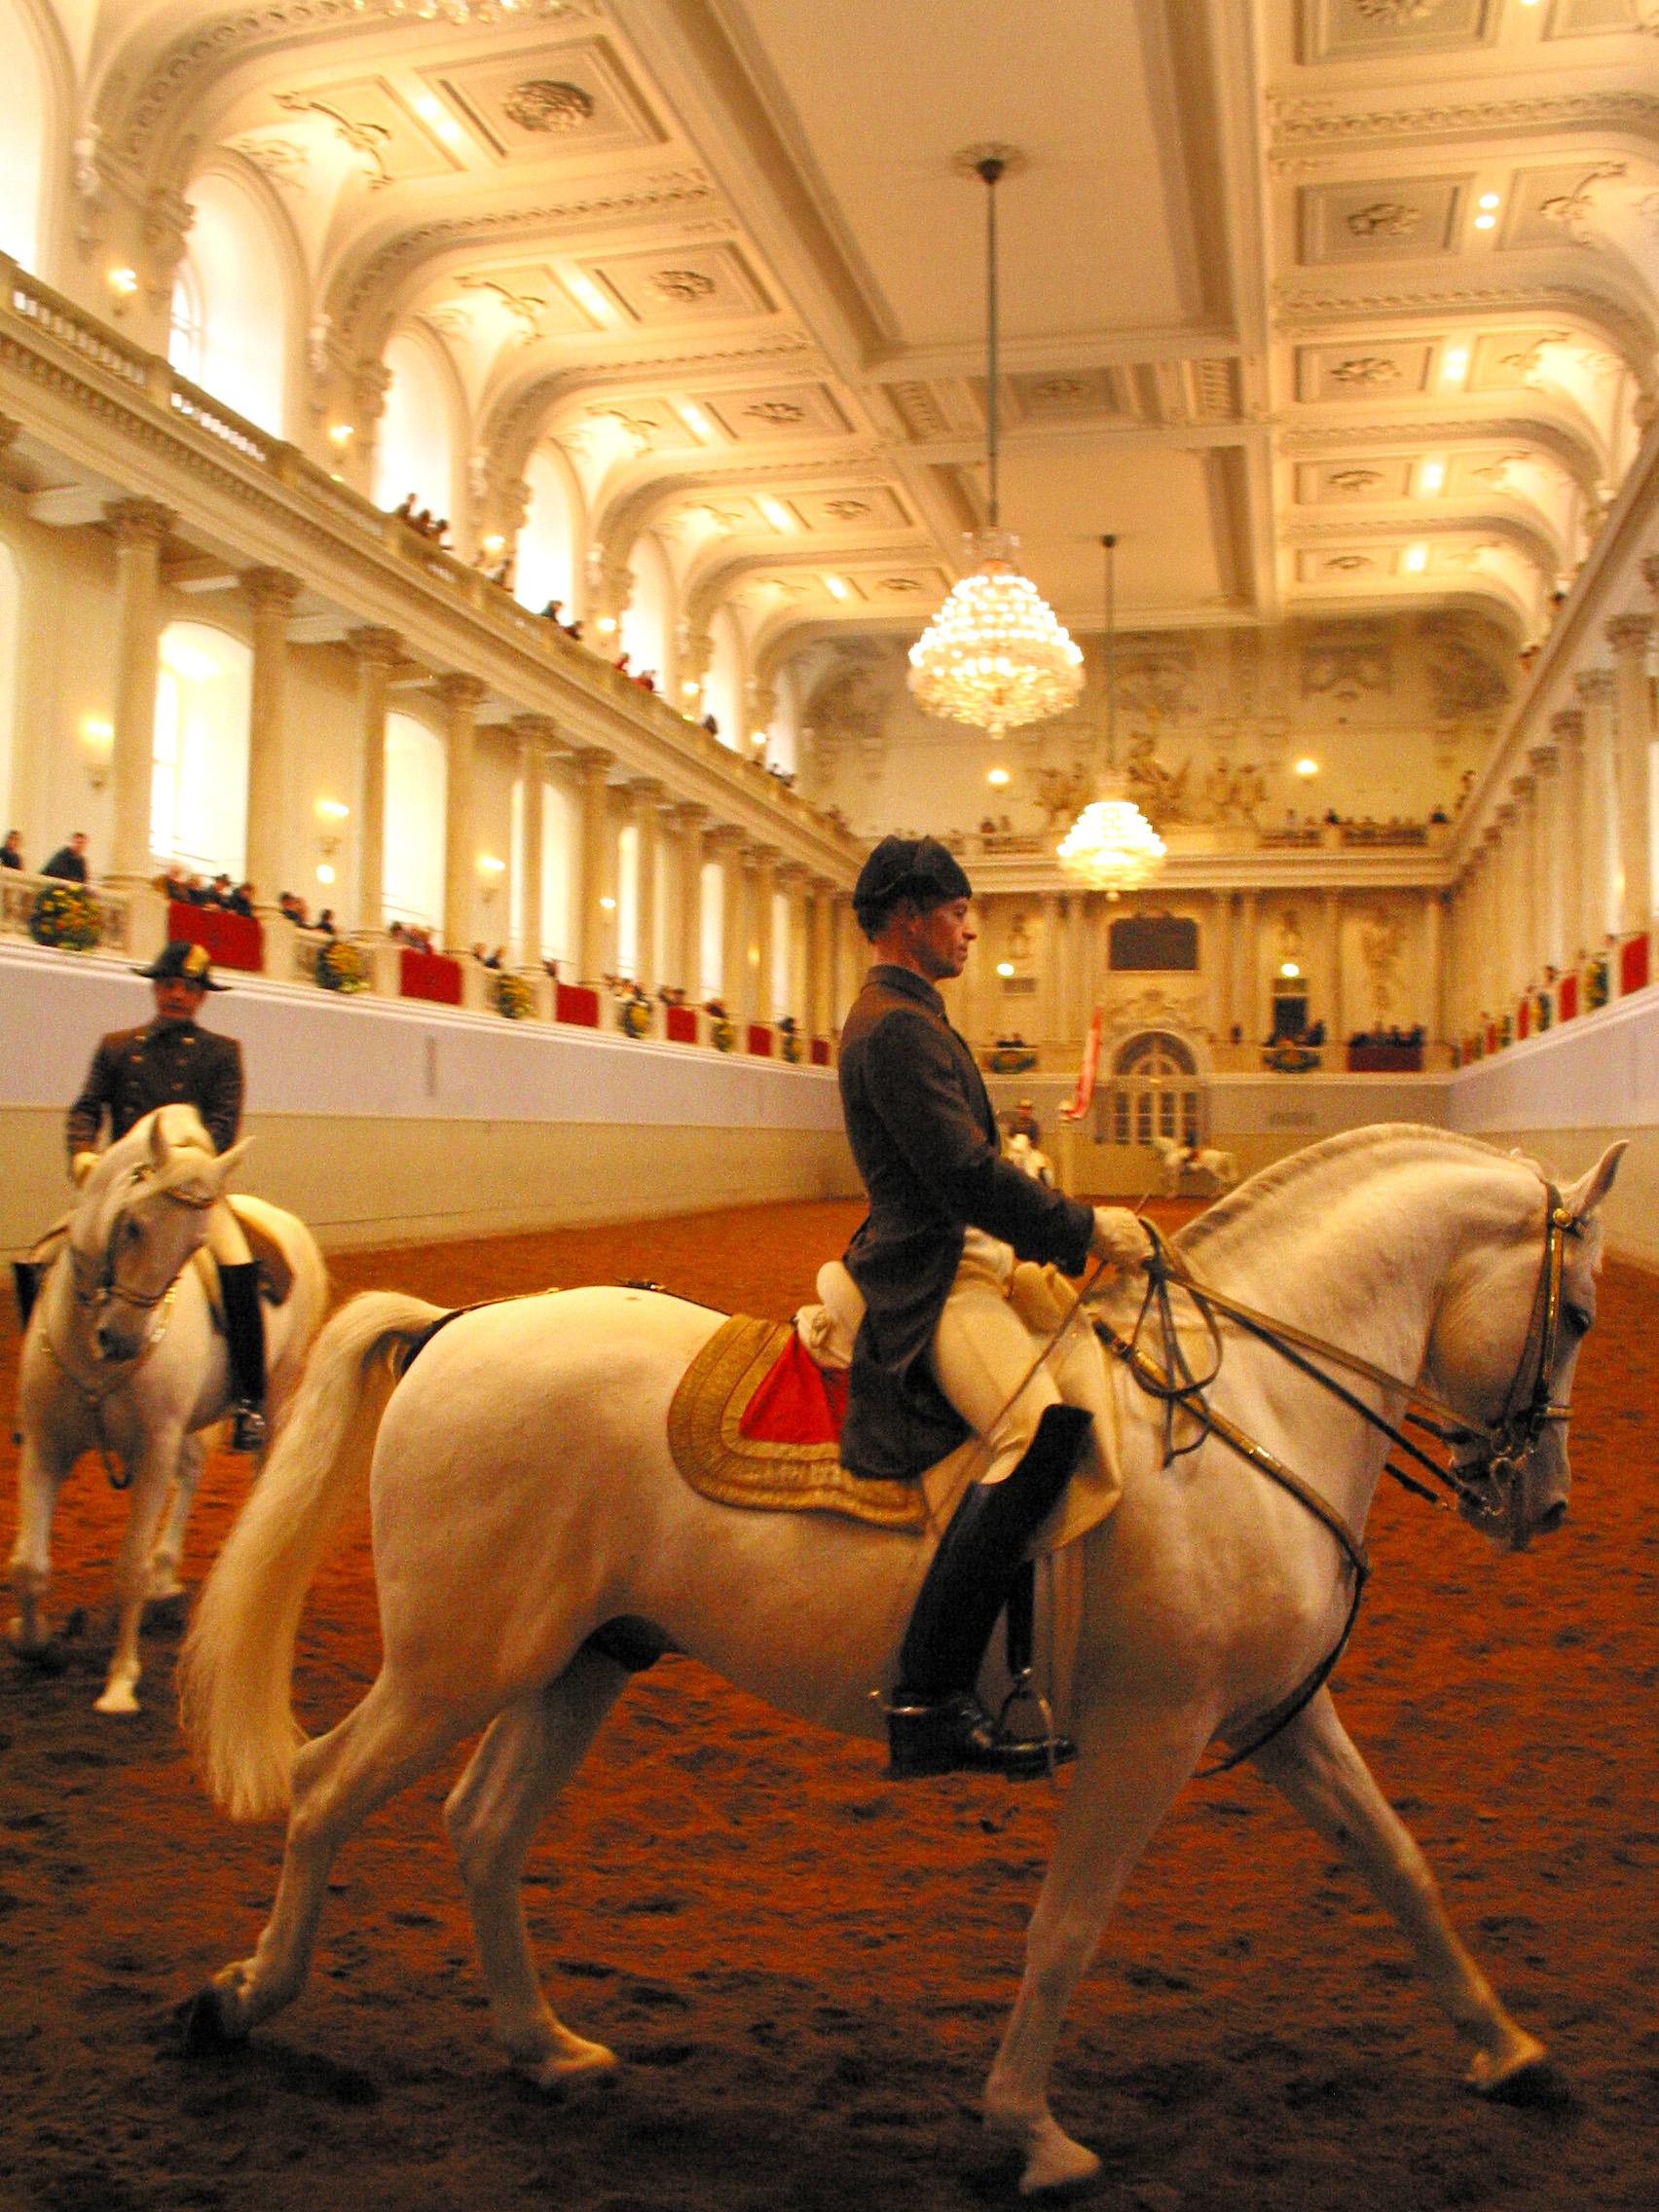 Royal Spanish Riding Academy, Vienna